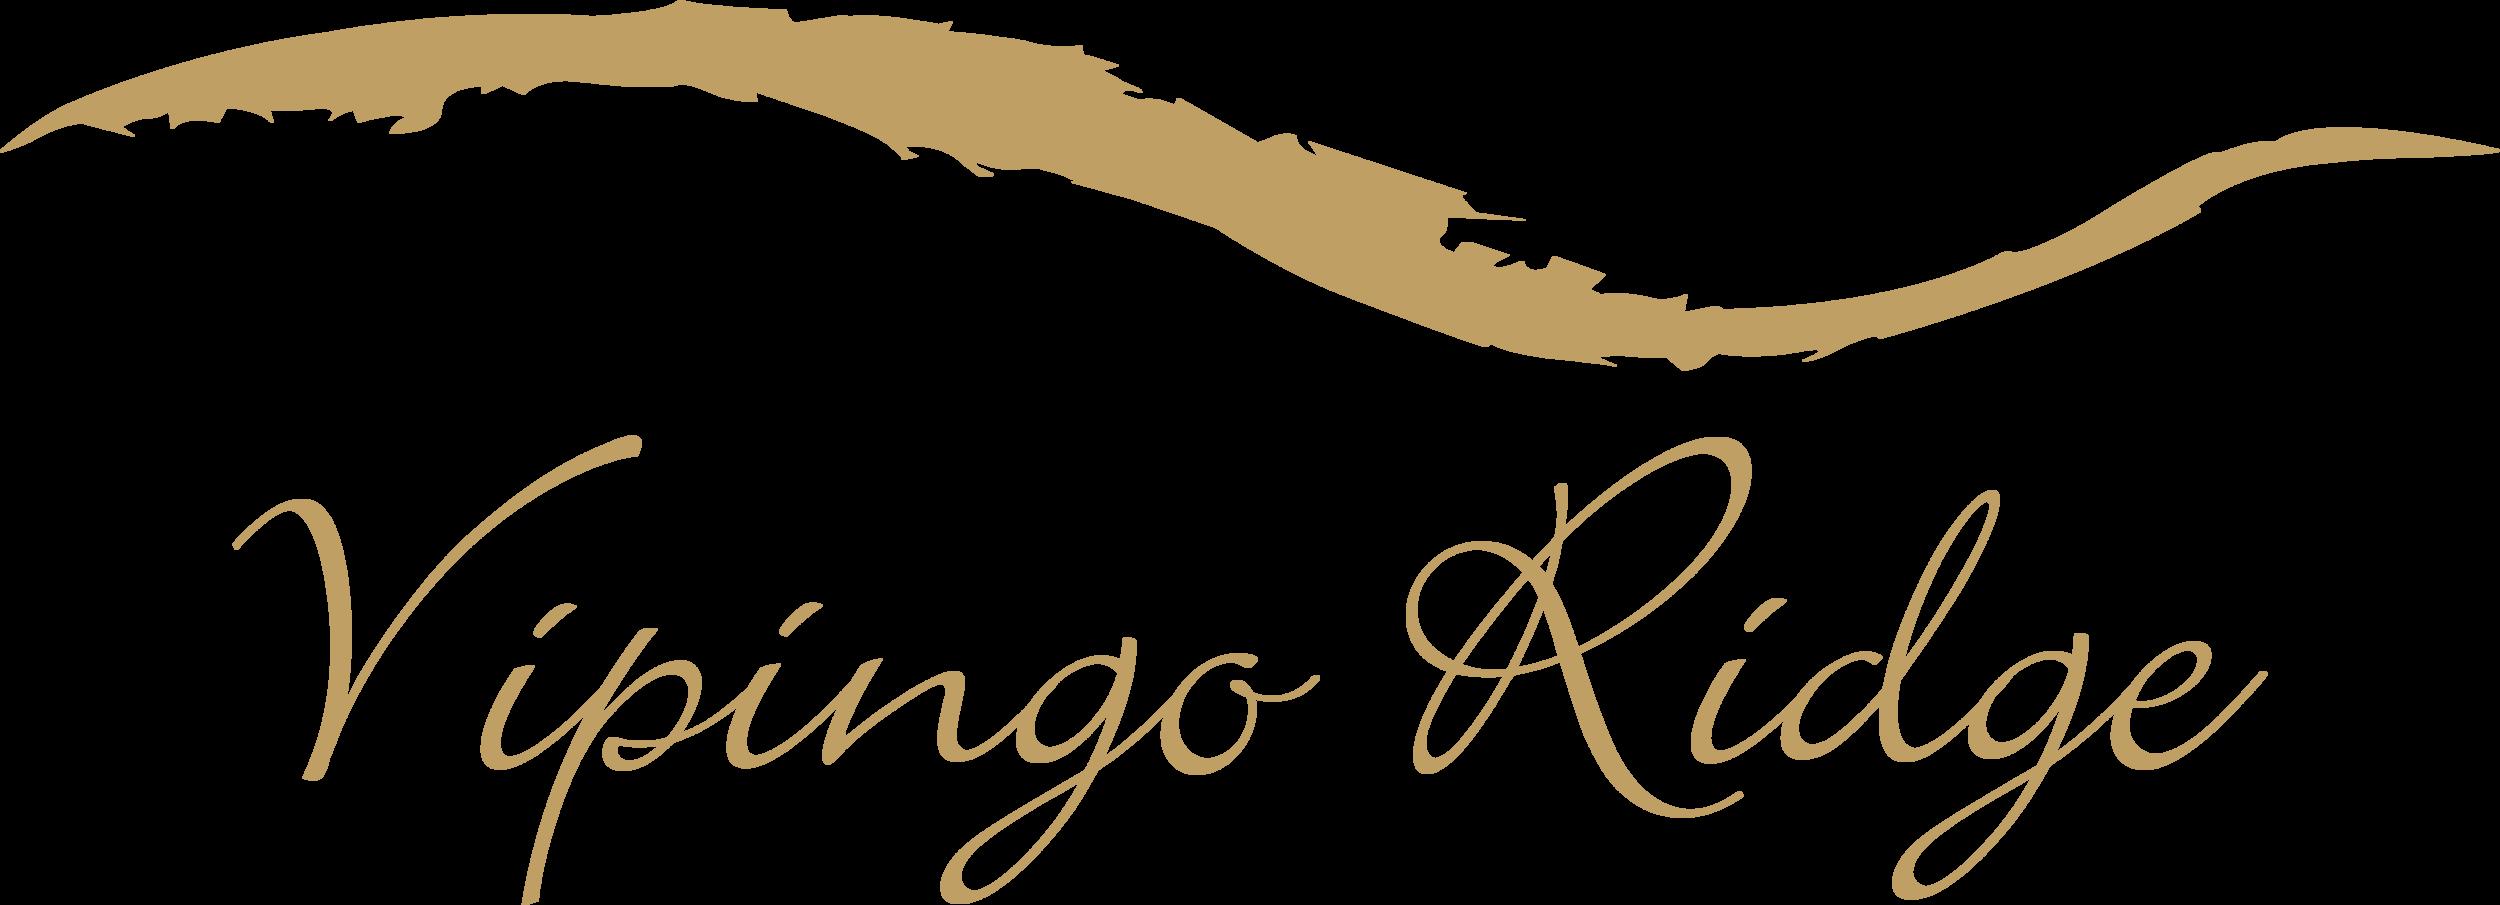 Vipingo Ridge logo -gold.png